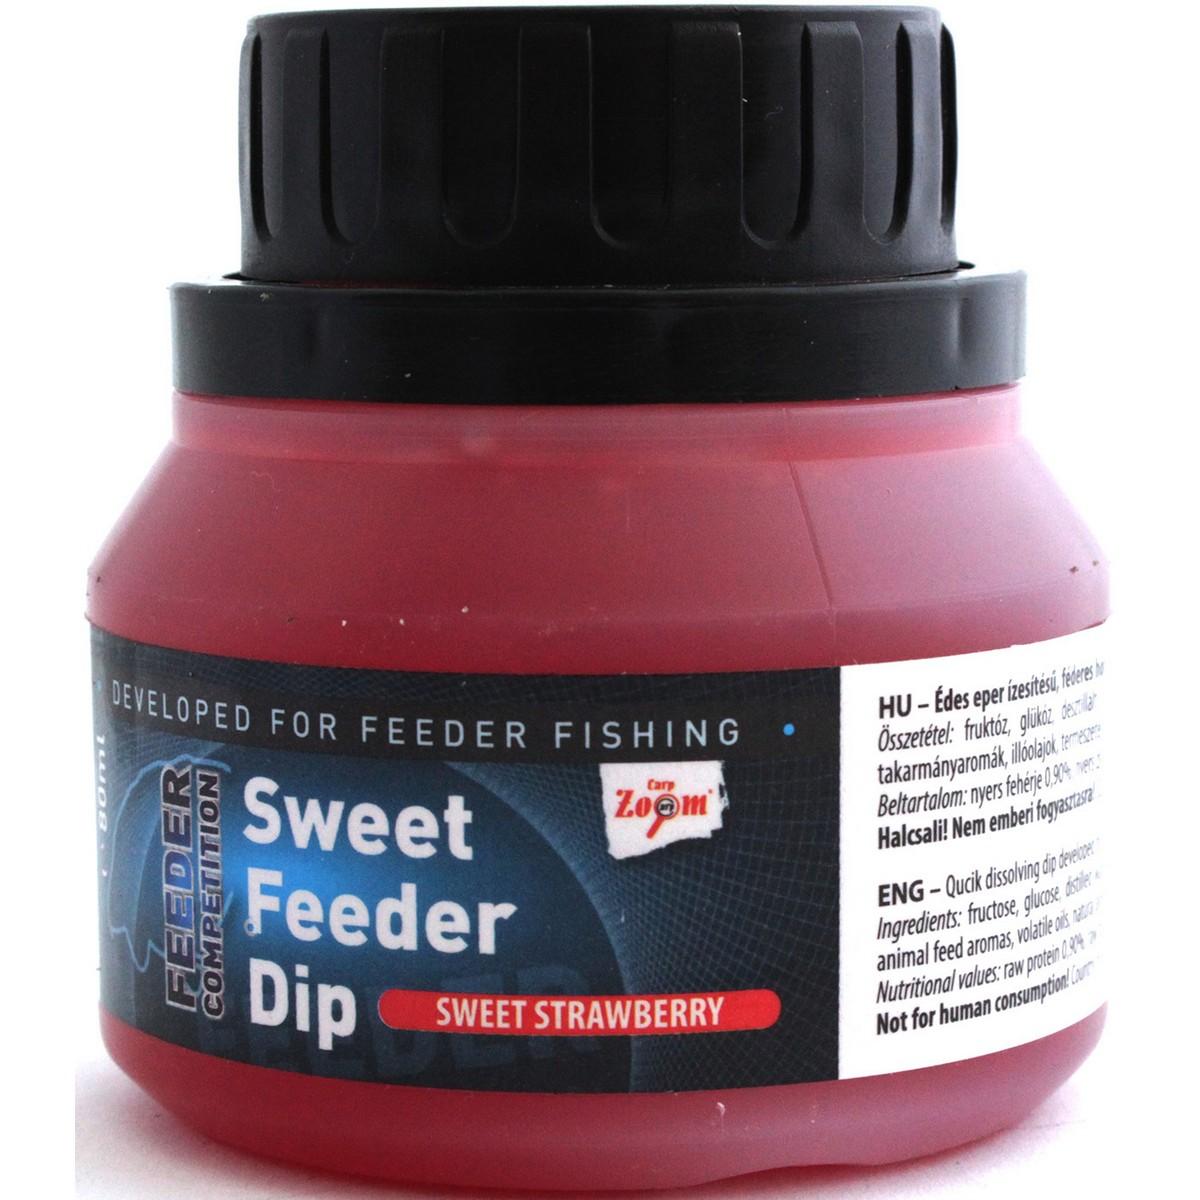 CZ FC Sweet Feeder Dip strawberry